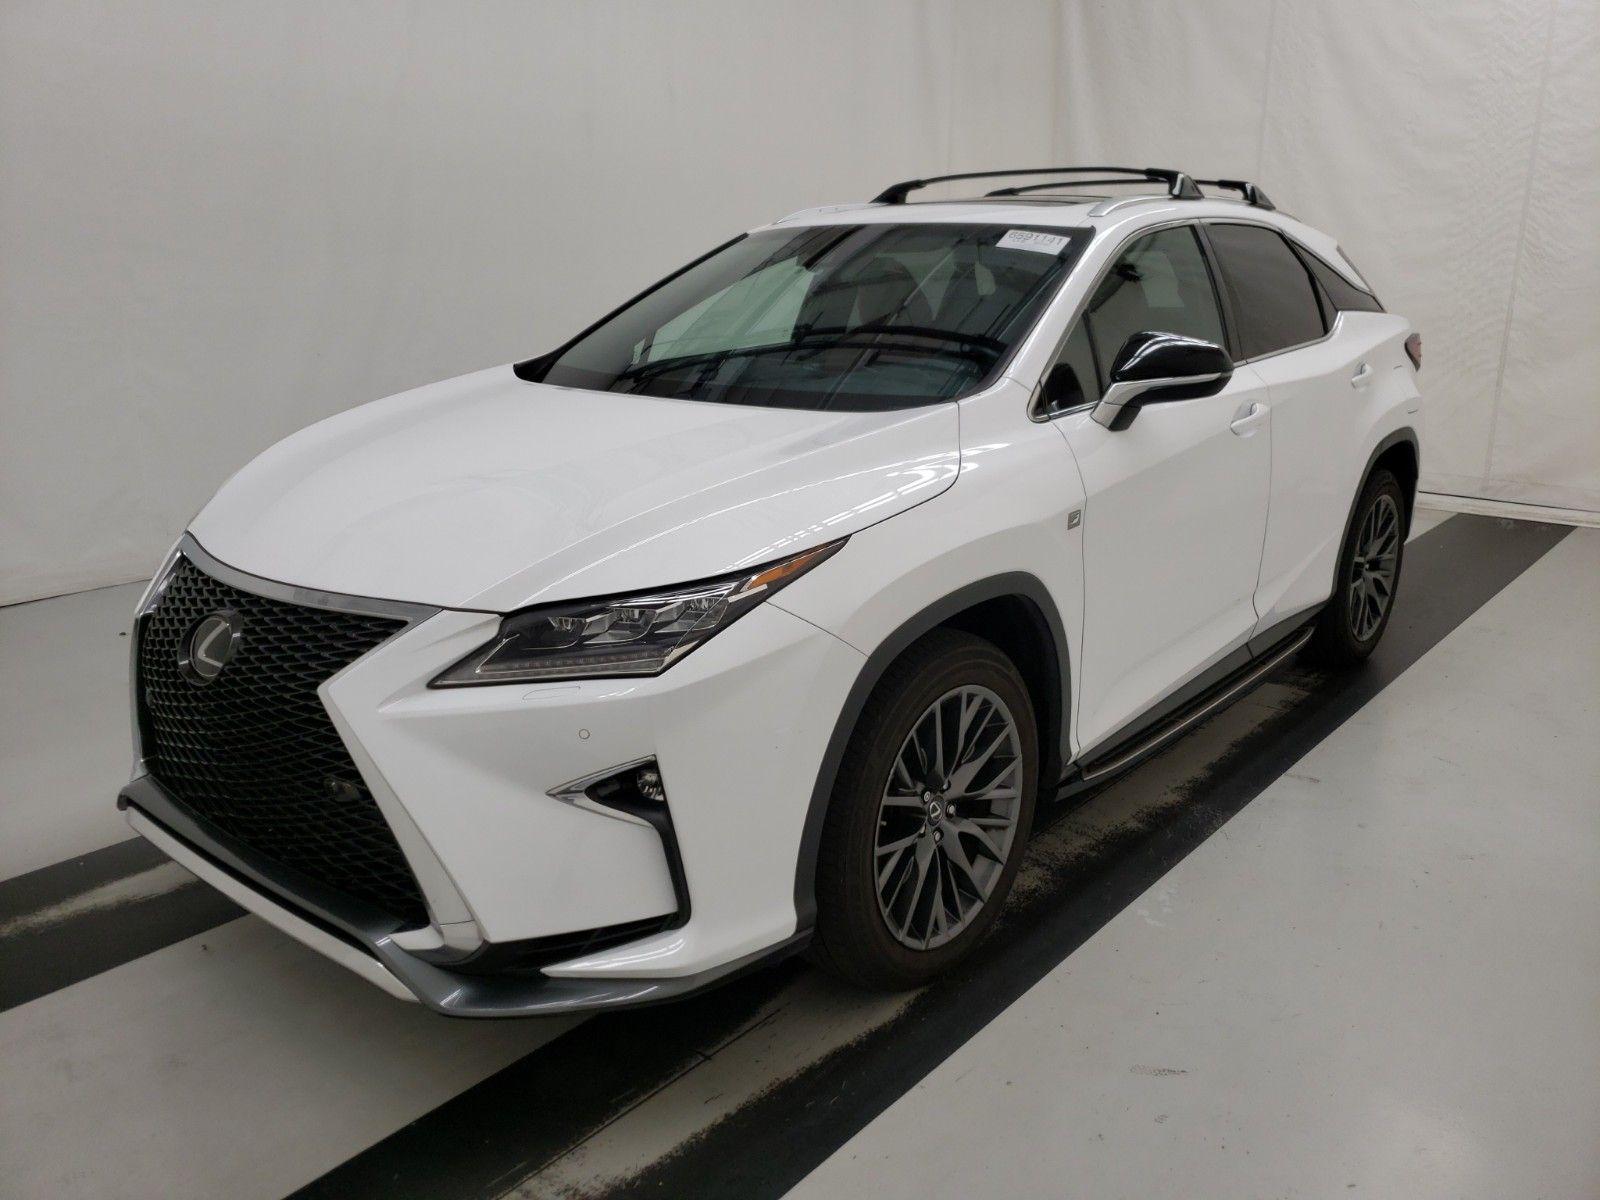 2018 Lexus Rx 3.5. Lot 99921242626 Vin 2T2BZMCA6JC142821